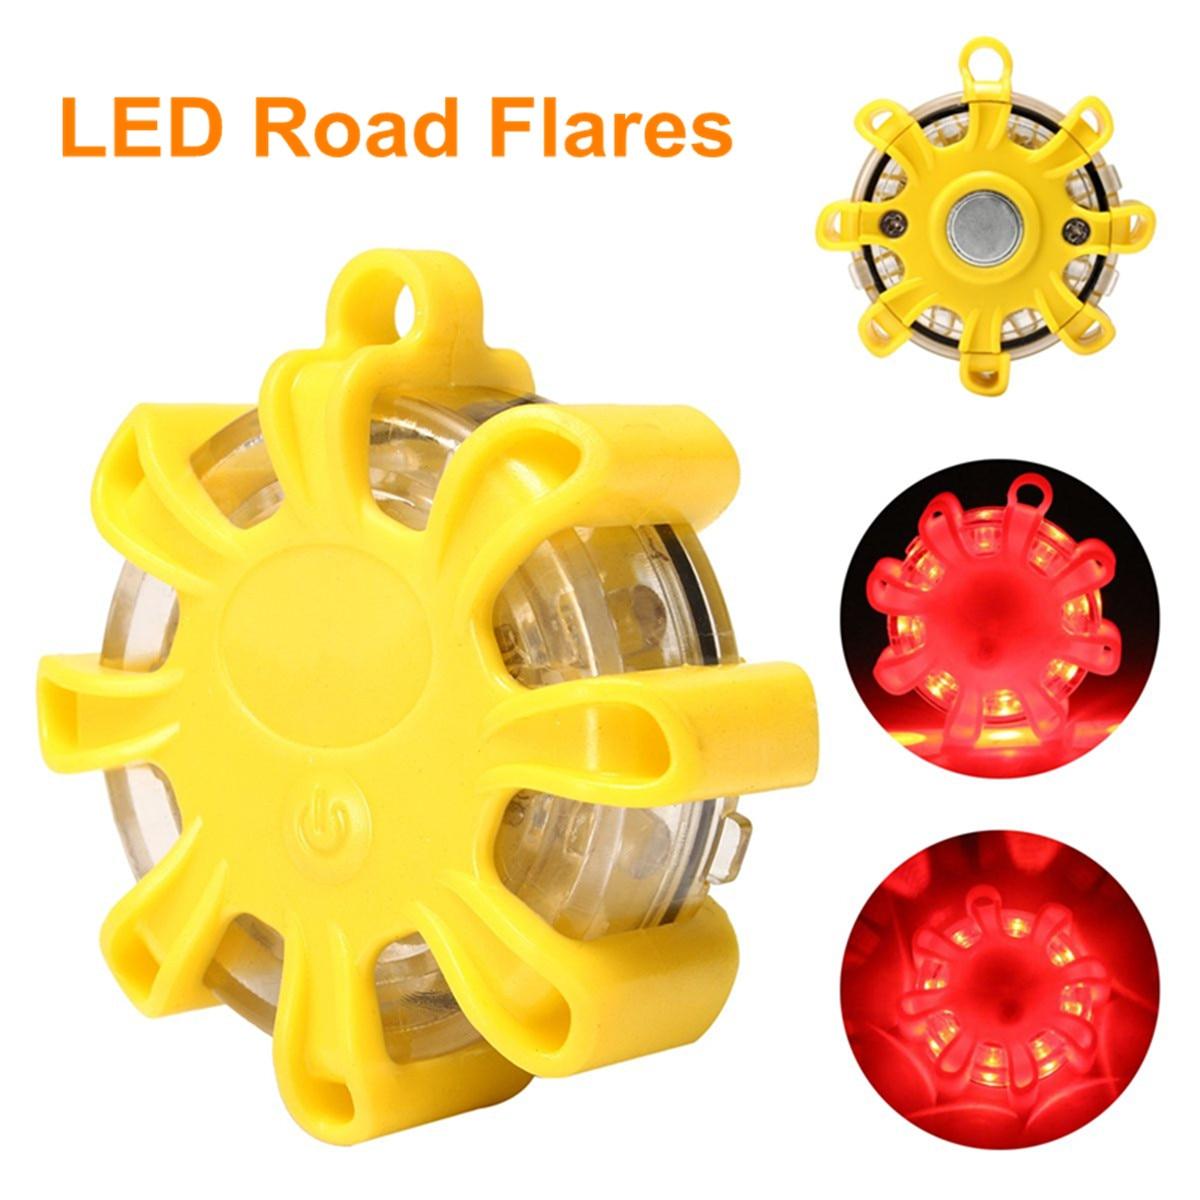 Multifunctional Portable LED Road Flare Safety Lights Emergency Beacon Magnetic Roadside Flashing Light Warning Road Rescue Lamp